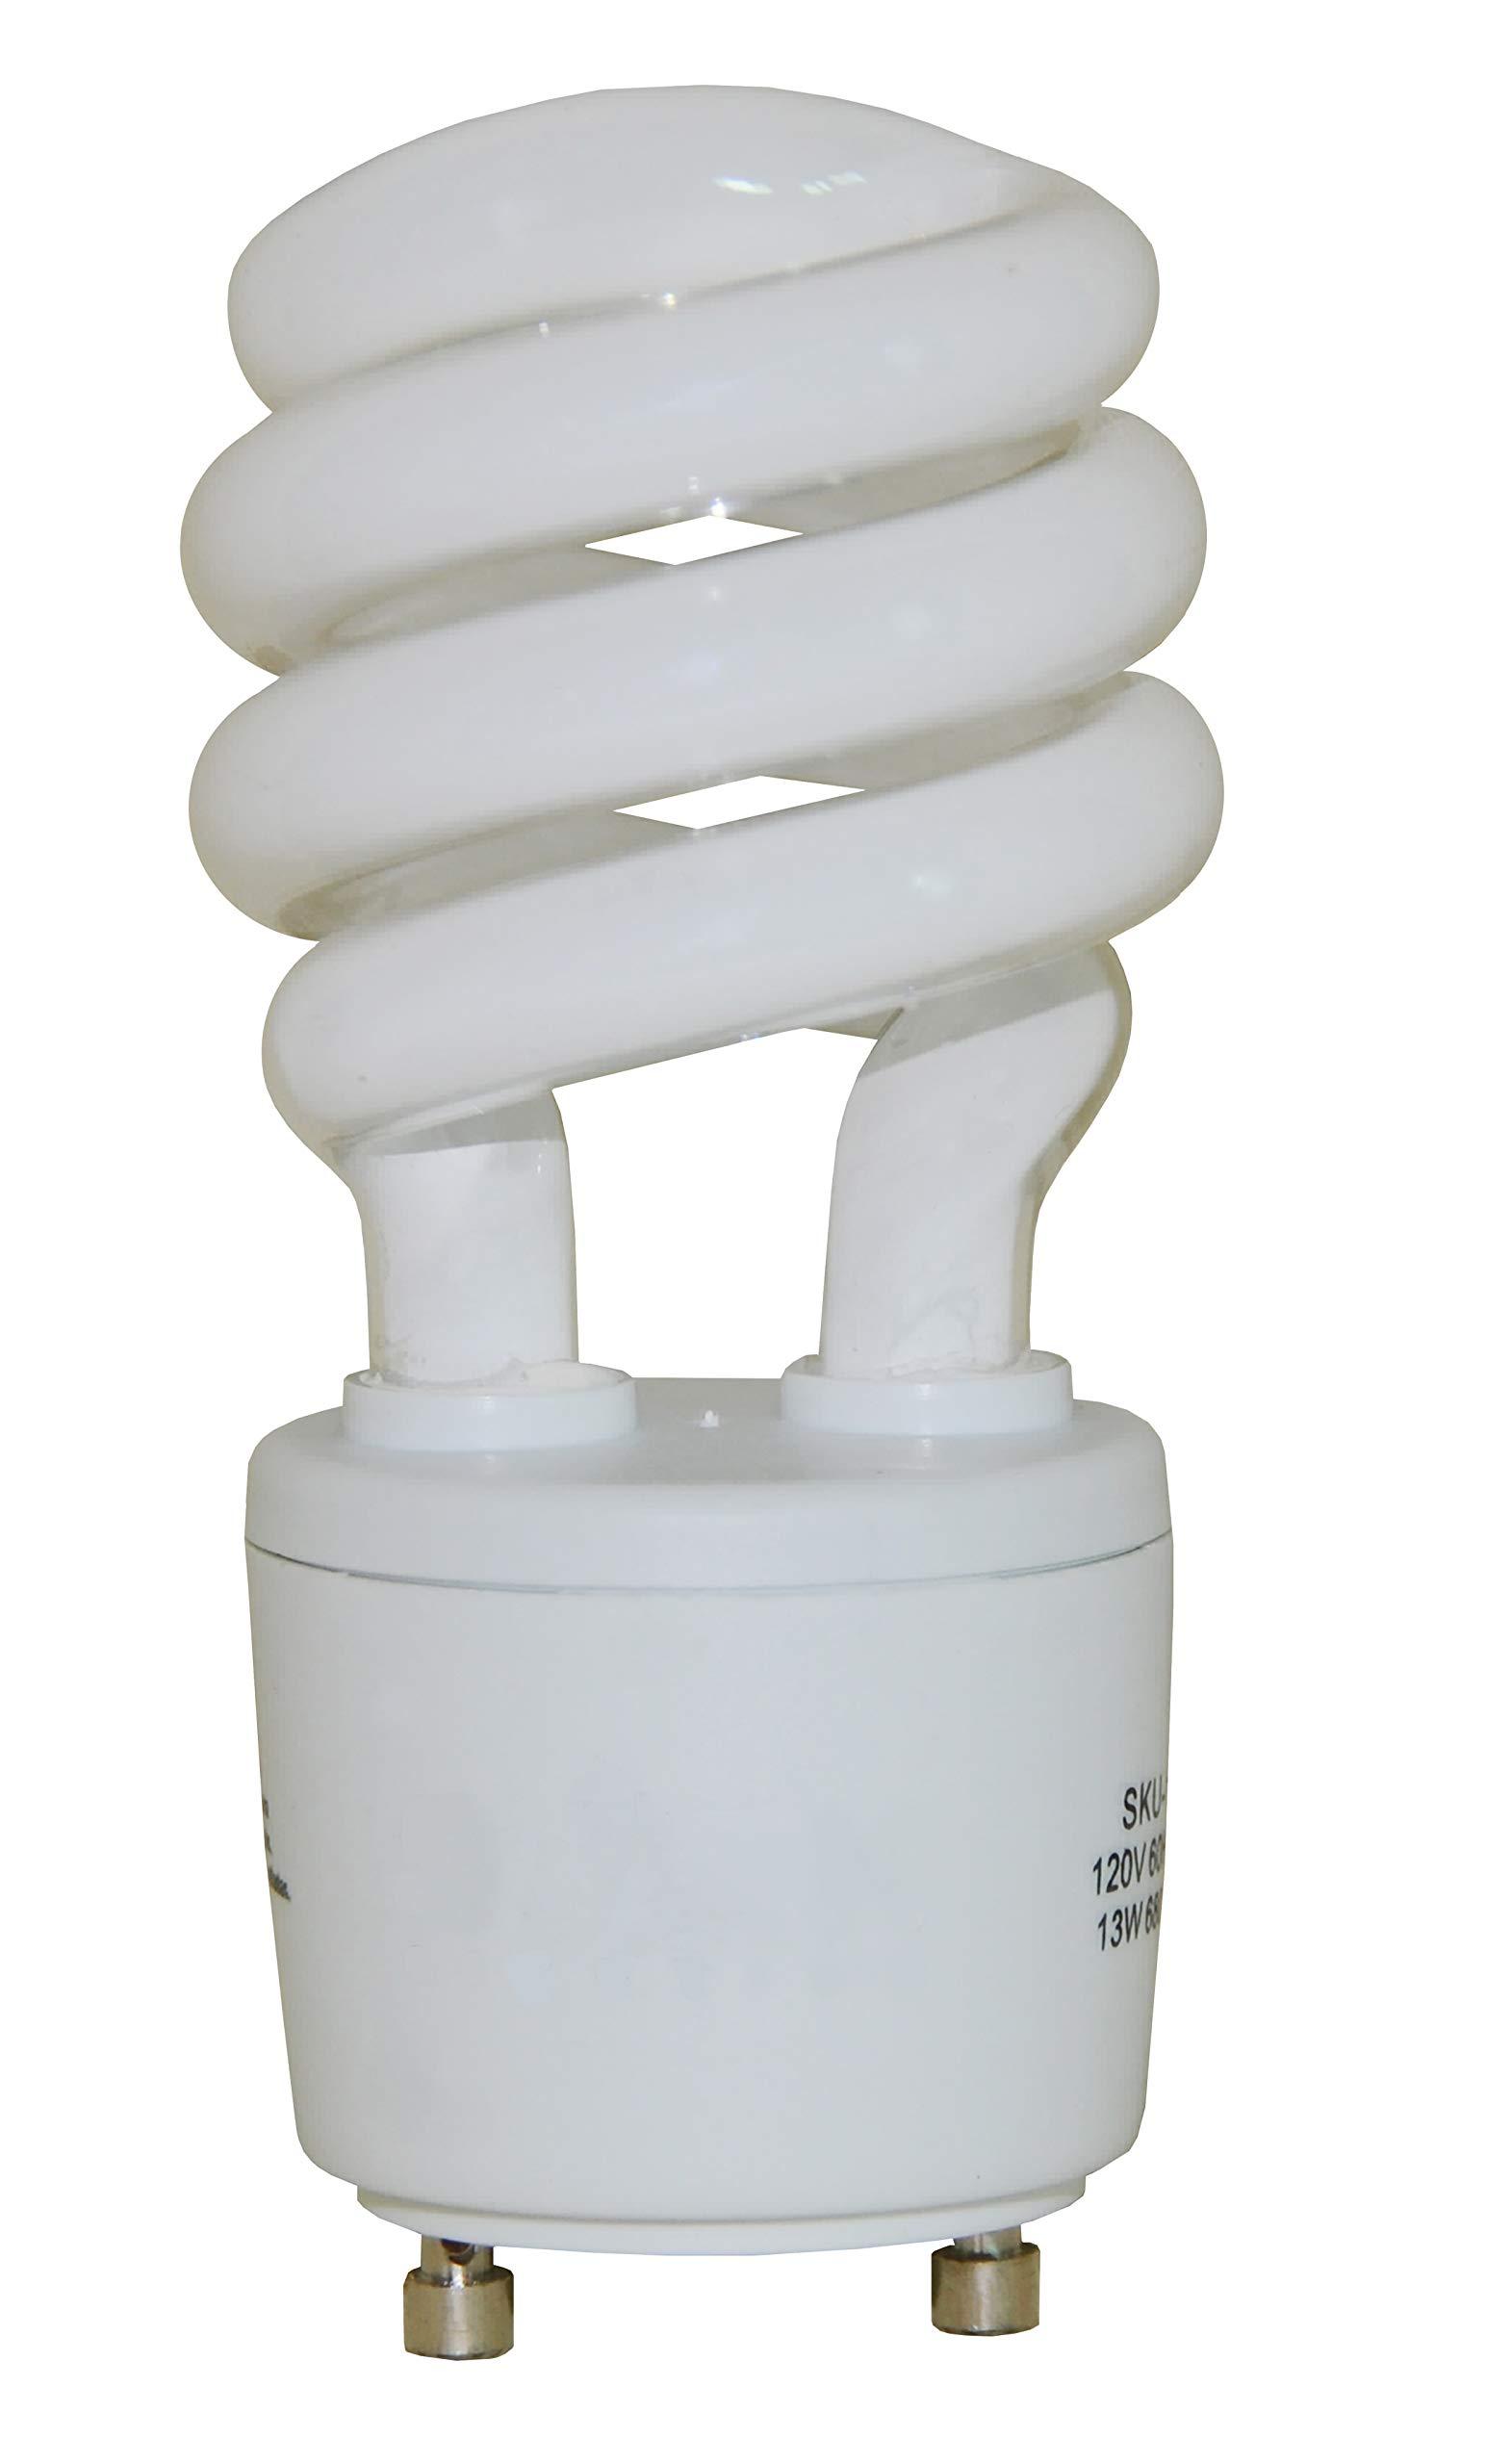 13 Watt Mini Spiral - GU24 Base - (60W Equivalent) CFL Light Bulb - 2700K Warm White - 4pack by CFL Bulb (Image #2)